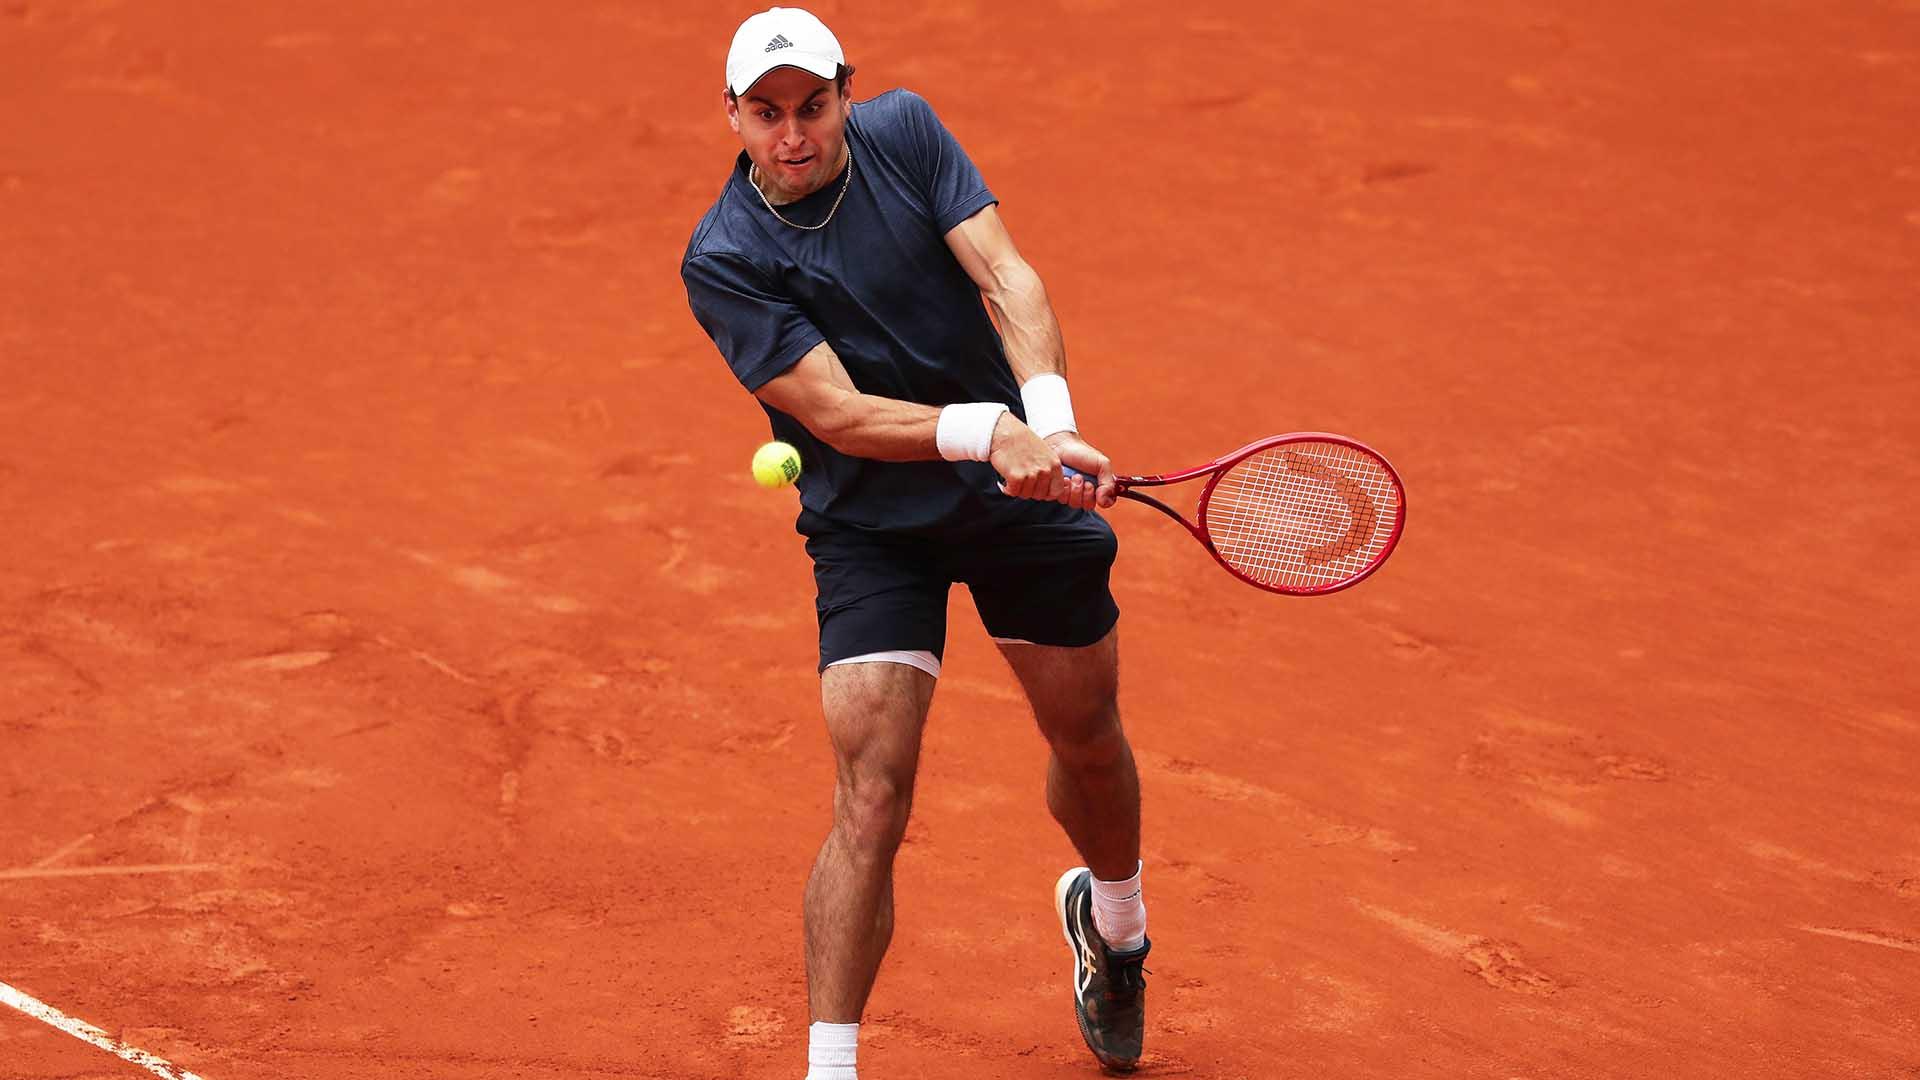 Madrid Open 2021: Diego Schwartzman vs. Aslan Karatsev Tennis Pick and Prediction